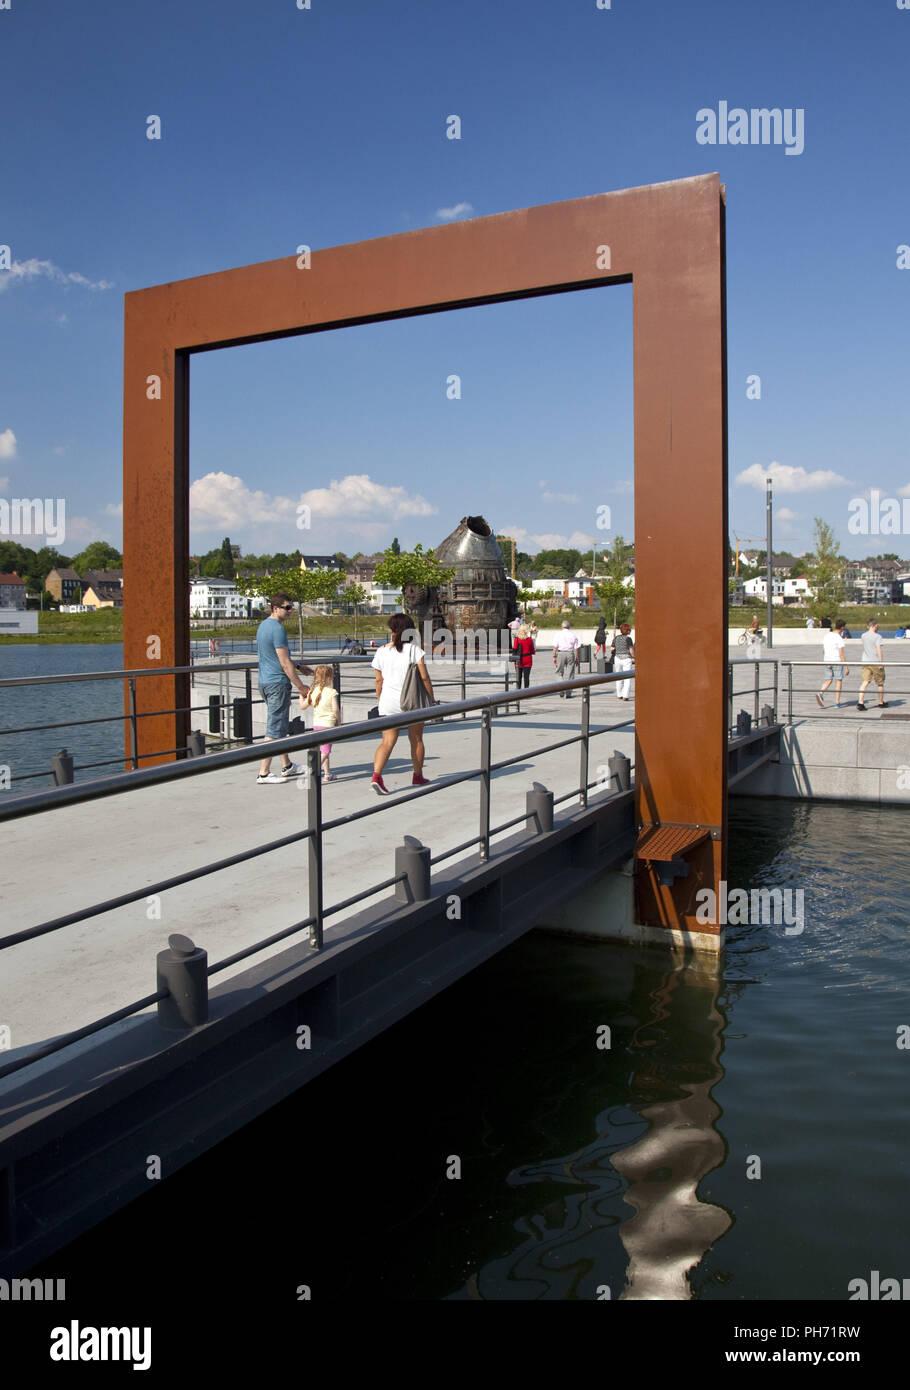 Culture Island, Phoenix Lake, Dortmund, Germany. - Stock Image